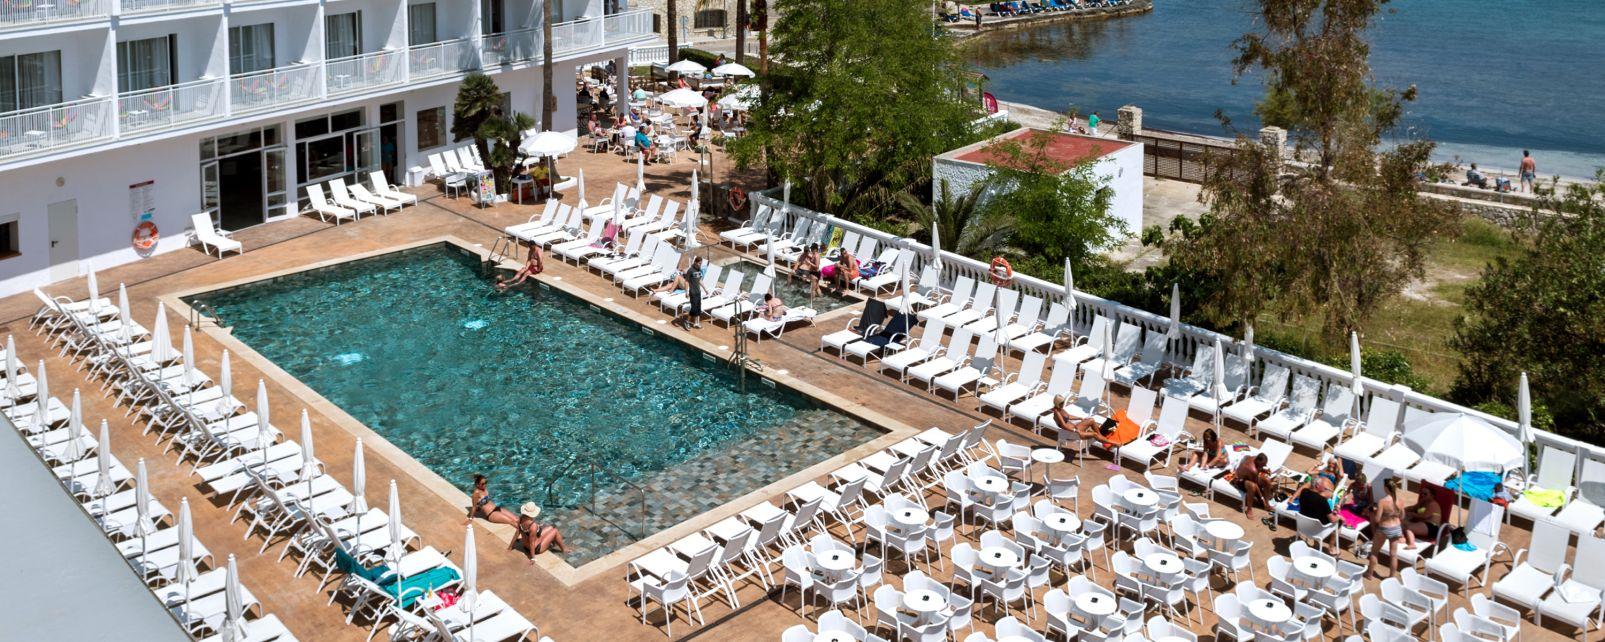 H tel club jet tours alcudia alc dia espagne for Hotels tours